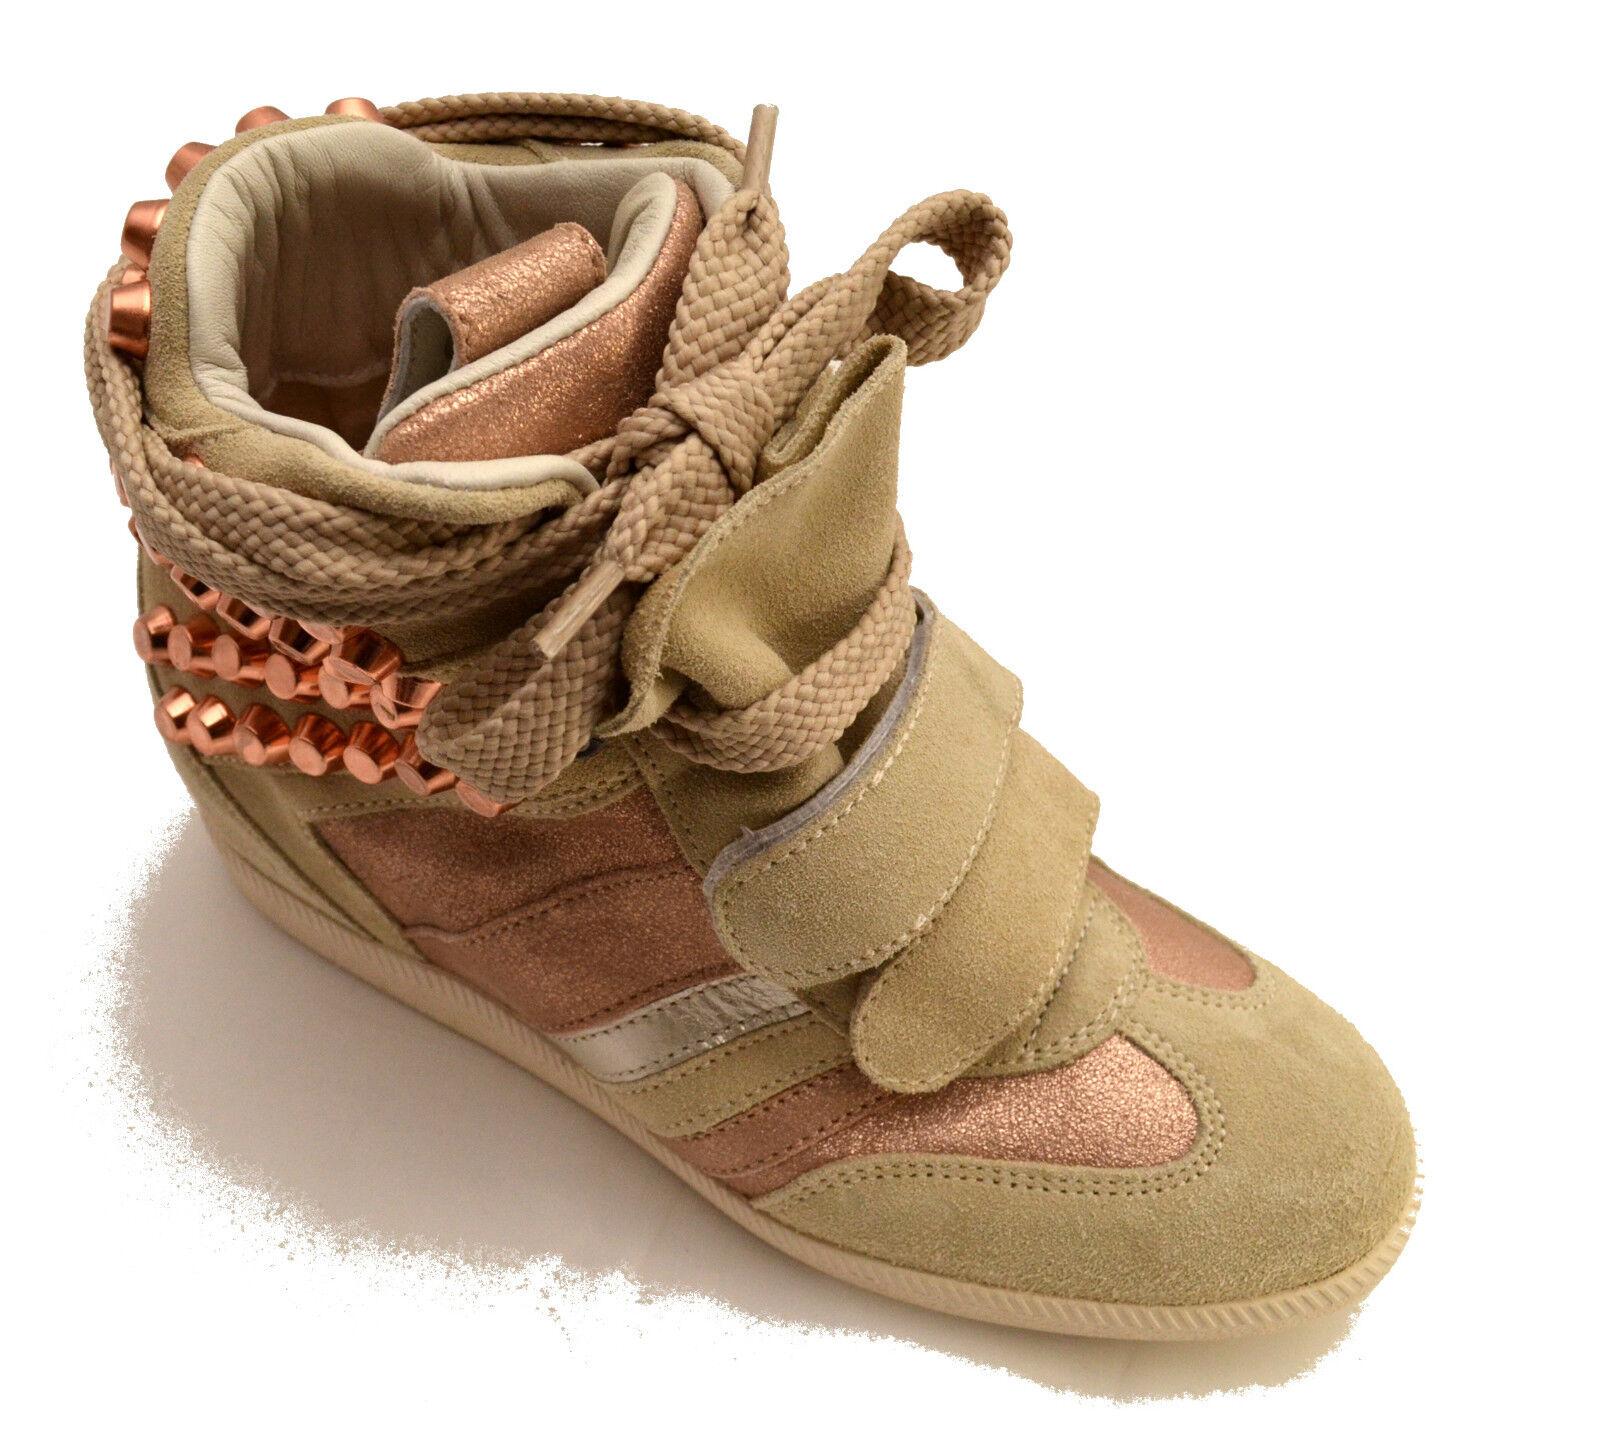 Serafini shoes Sneakers High Skin shoes Woman Studs Wedge Vintage Women 2764